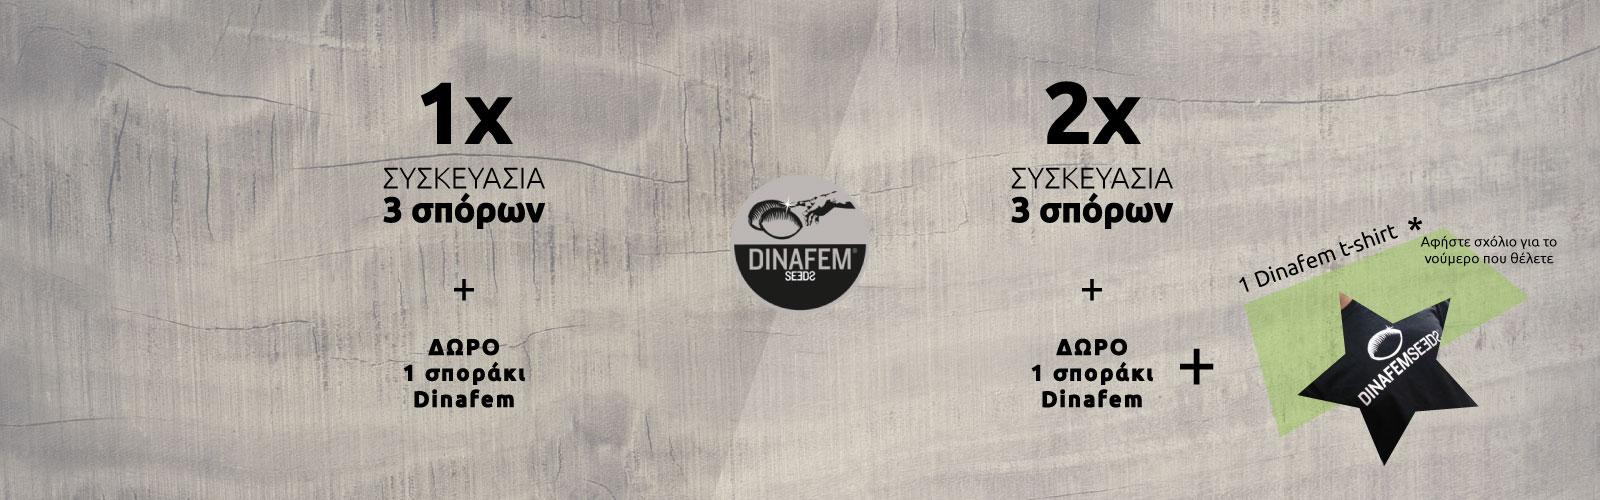 Dinafem-1x-2x-offer-4